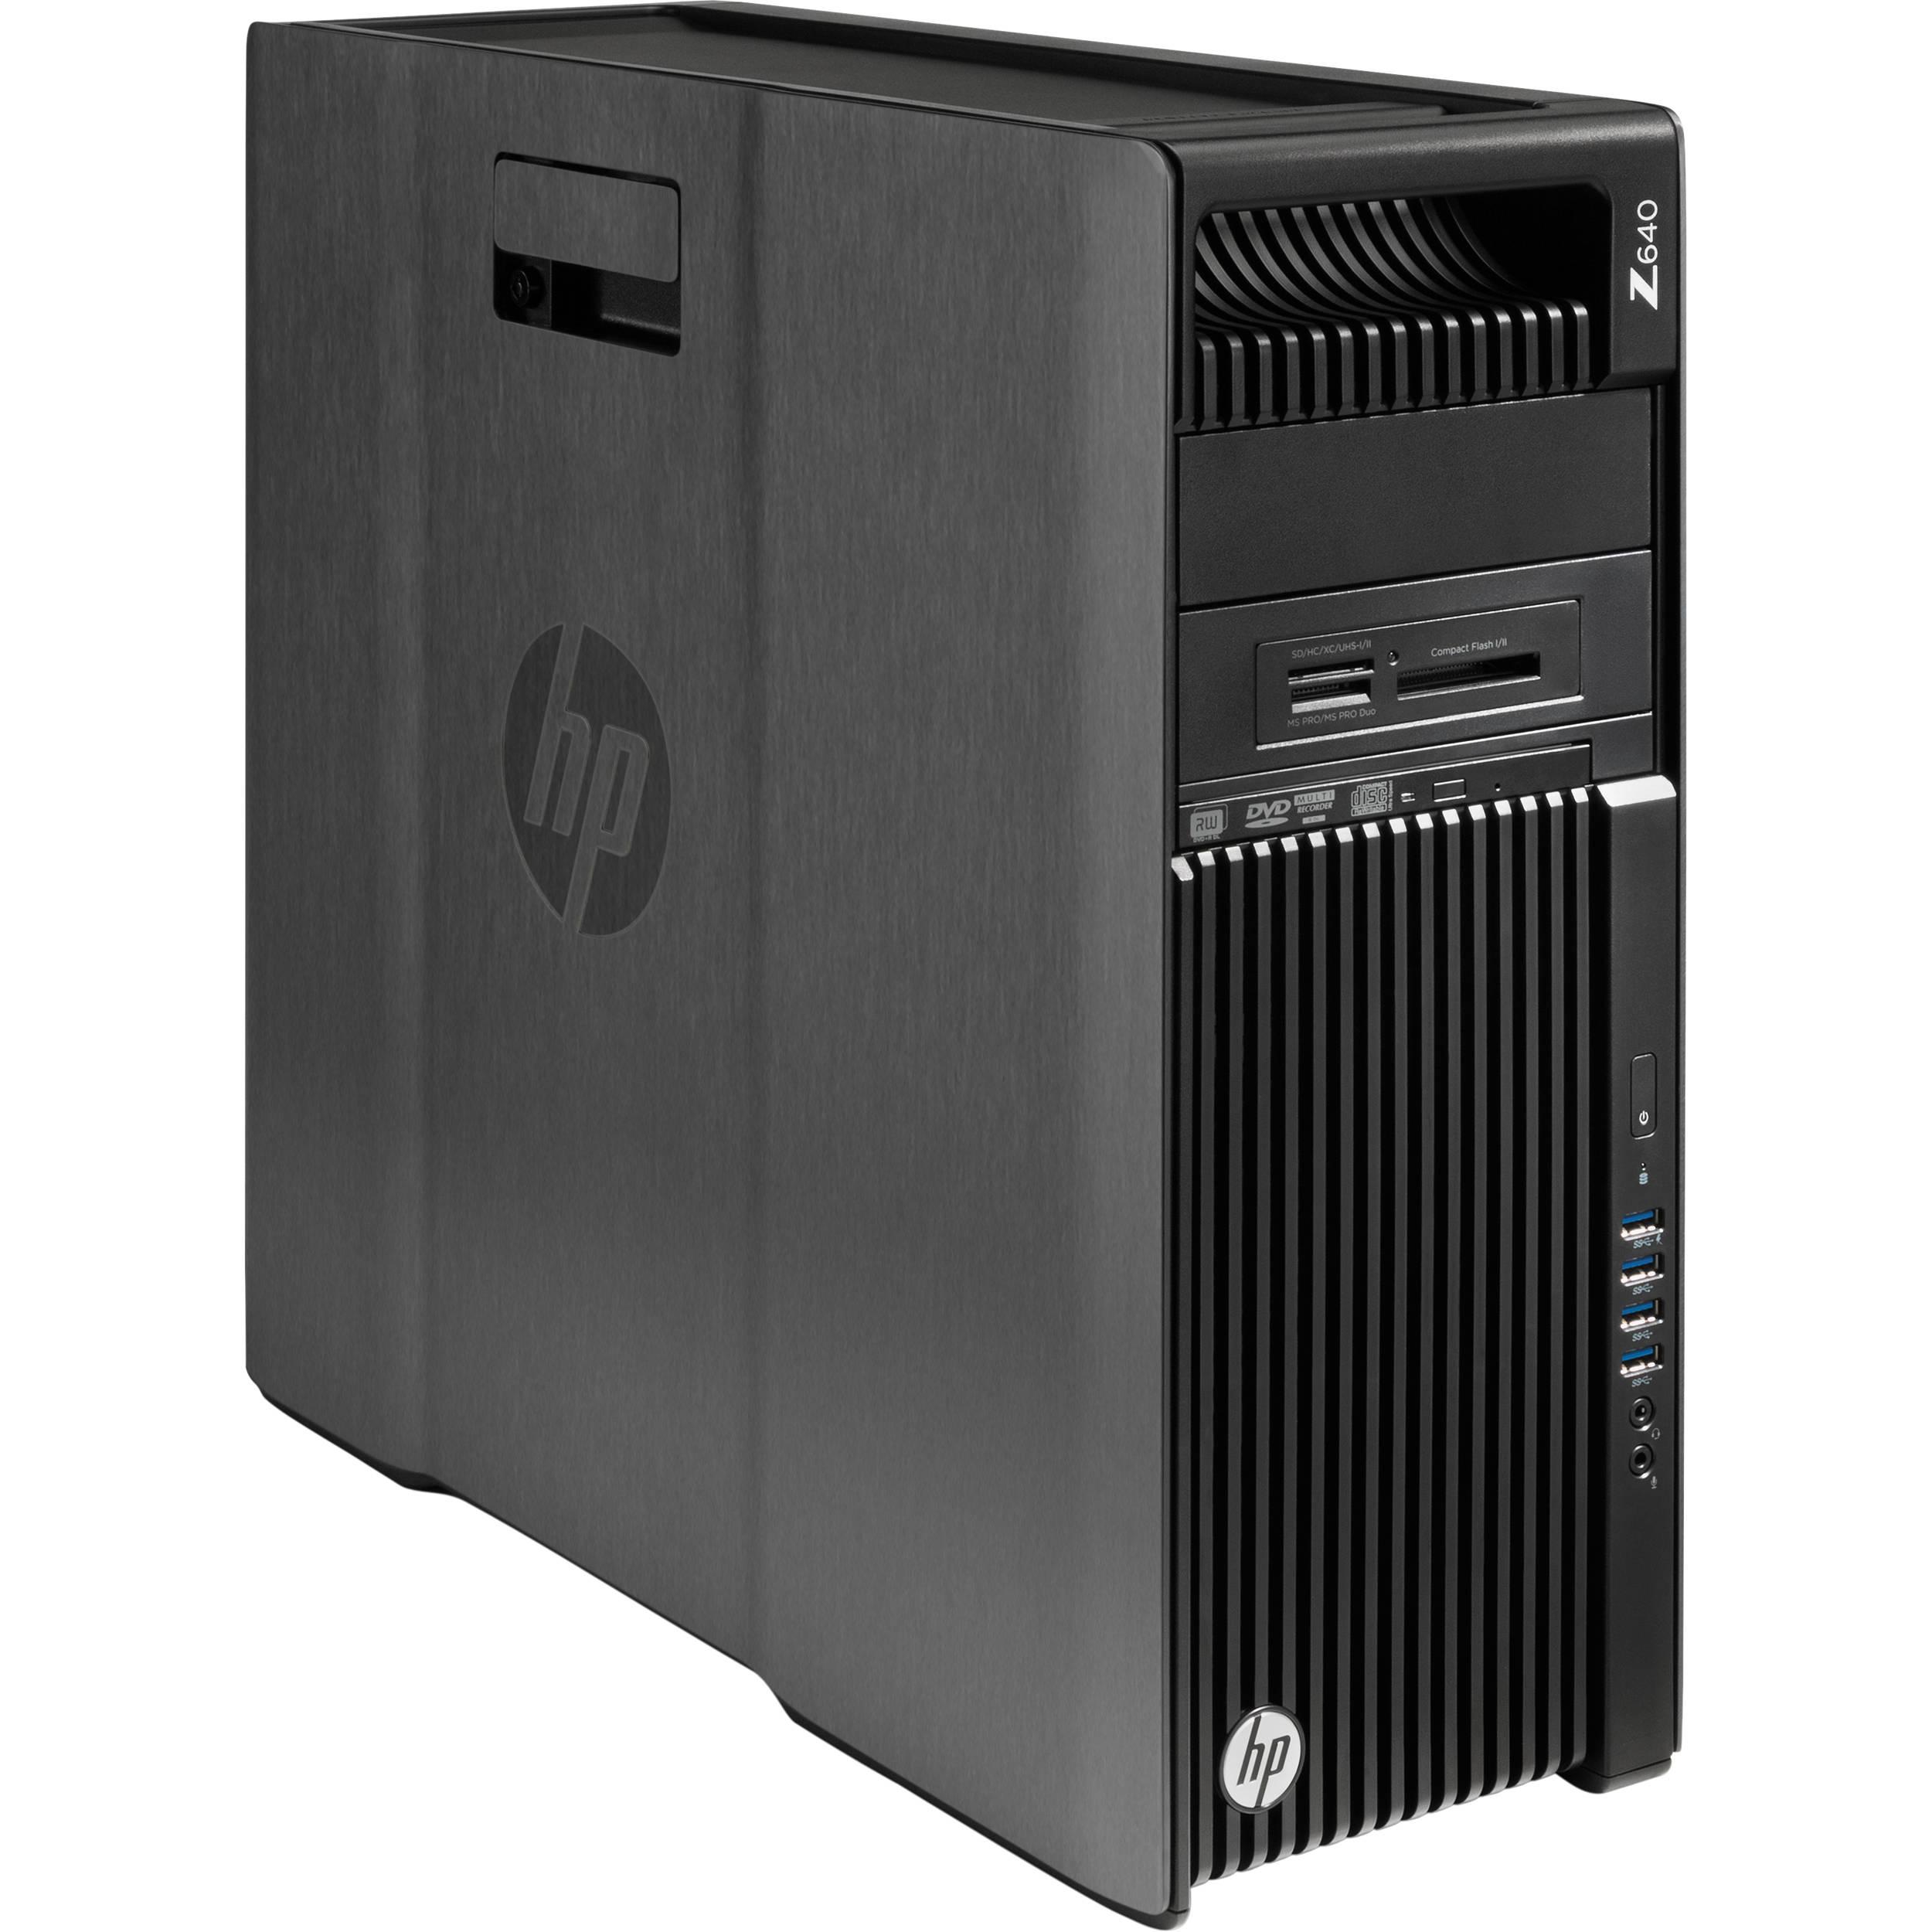 HP Z640 MT Intel E5-2650v4 2.2 2400/32GB DDR4-2400 (4x8GB)/512 SSD PCIe/W10P